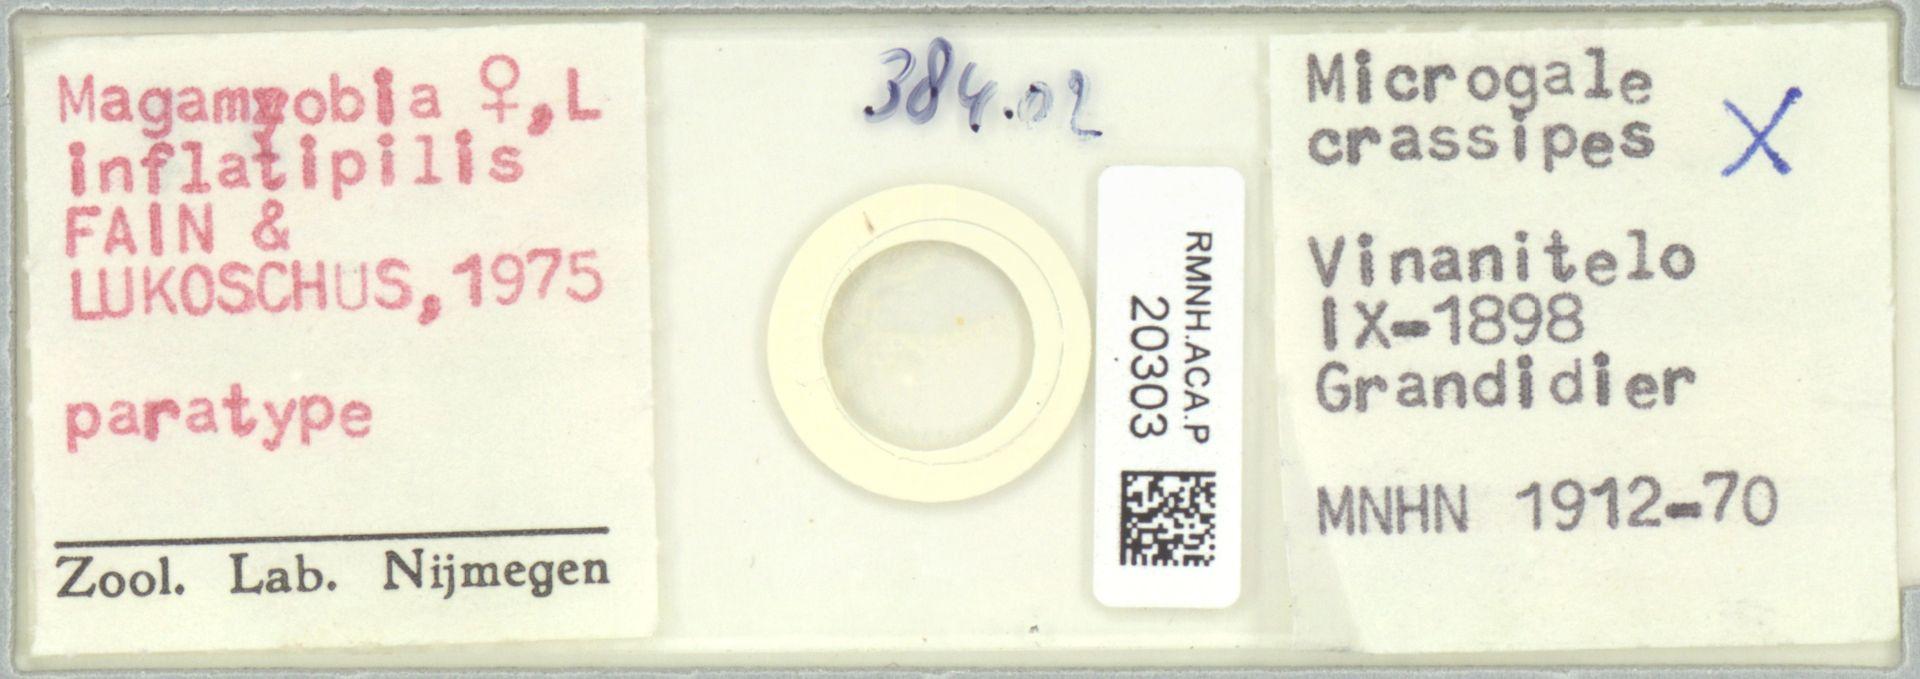 RMNH.ACA.P.20303   Mafamyobia inflatipilis